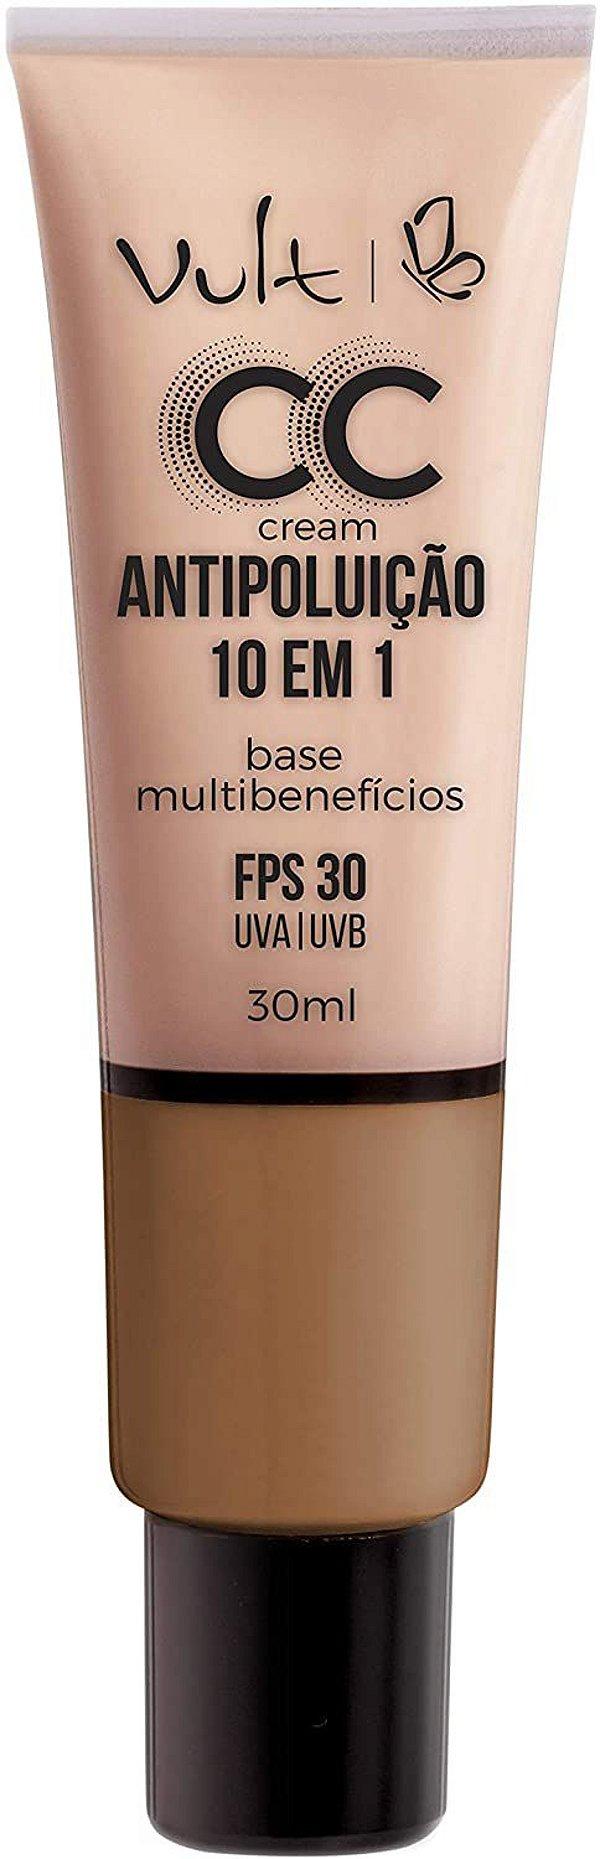 CC Cream Vult Base Multibenefícios 10 em 1 - MB05 - 30ml